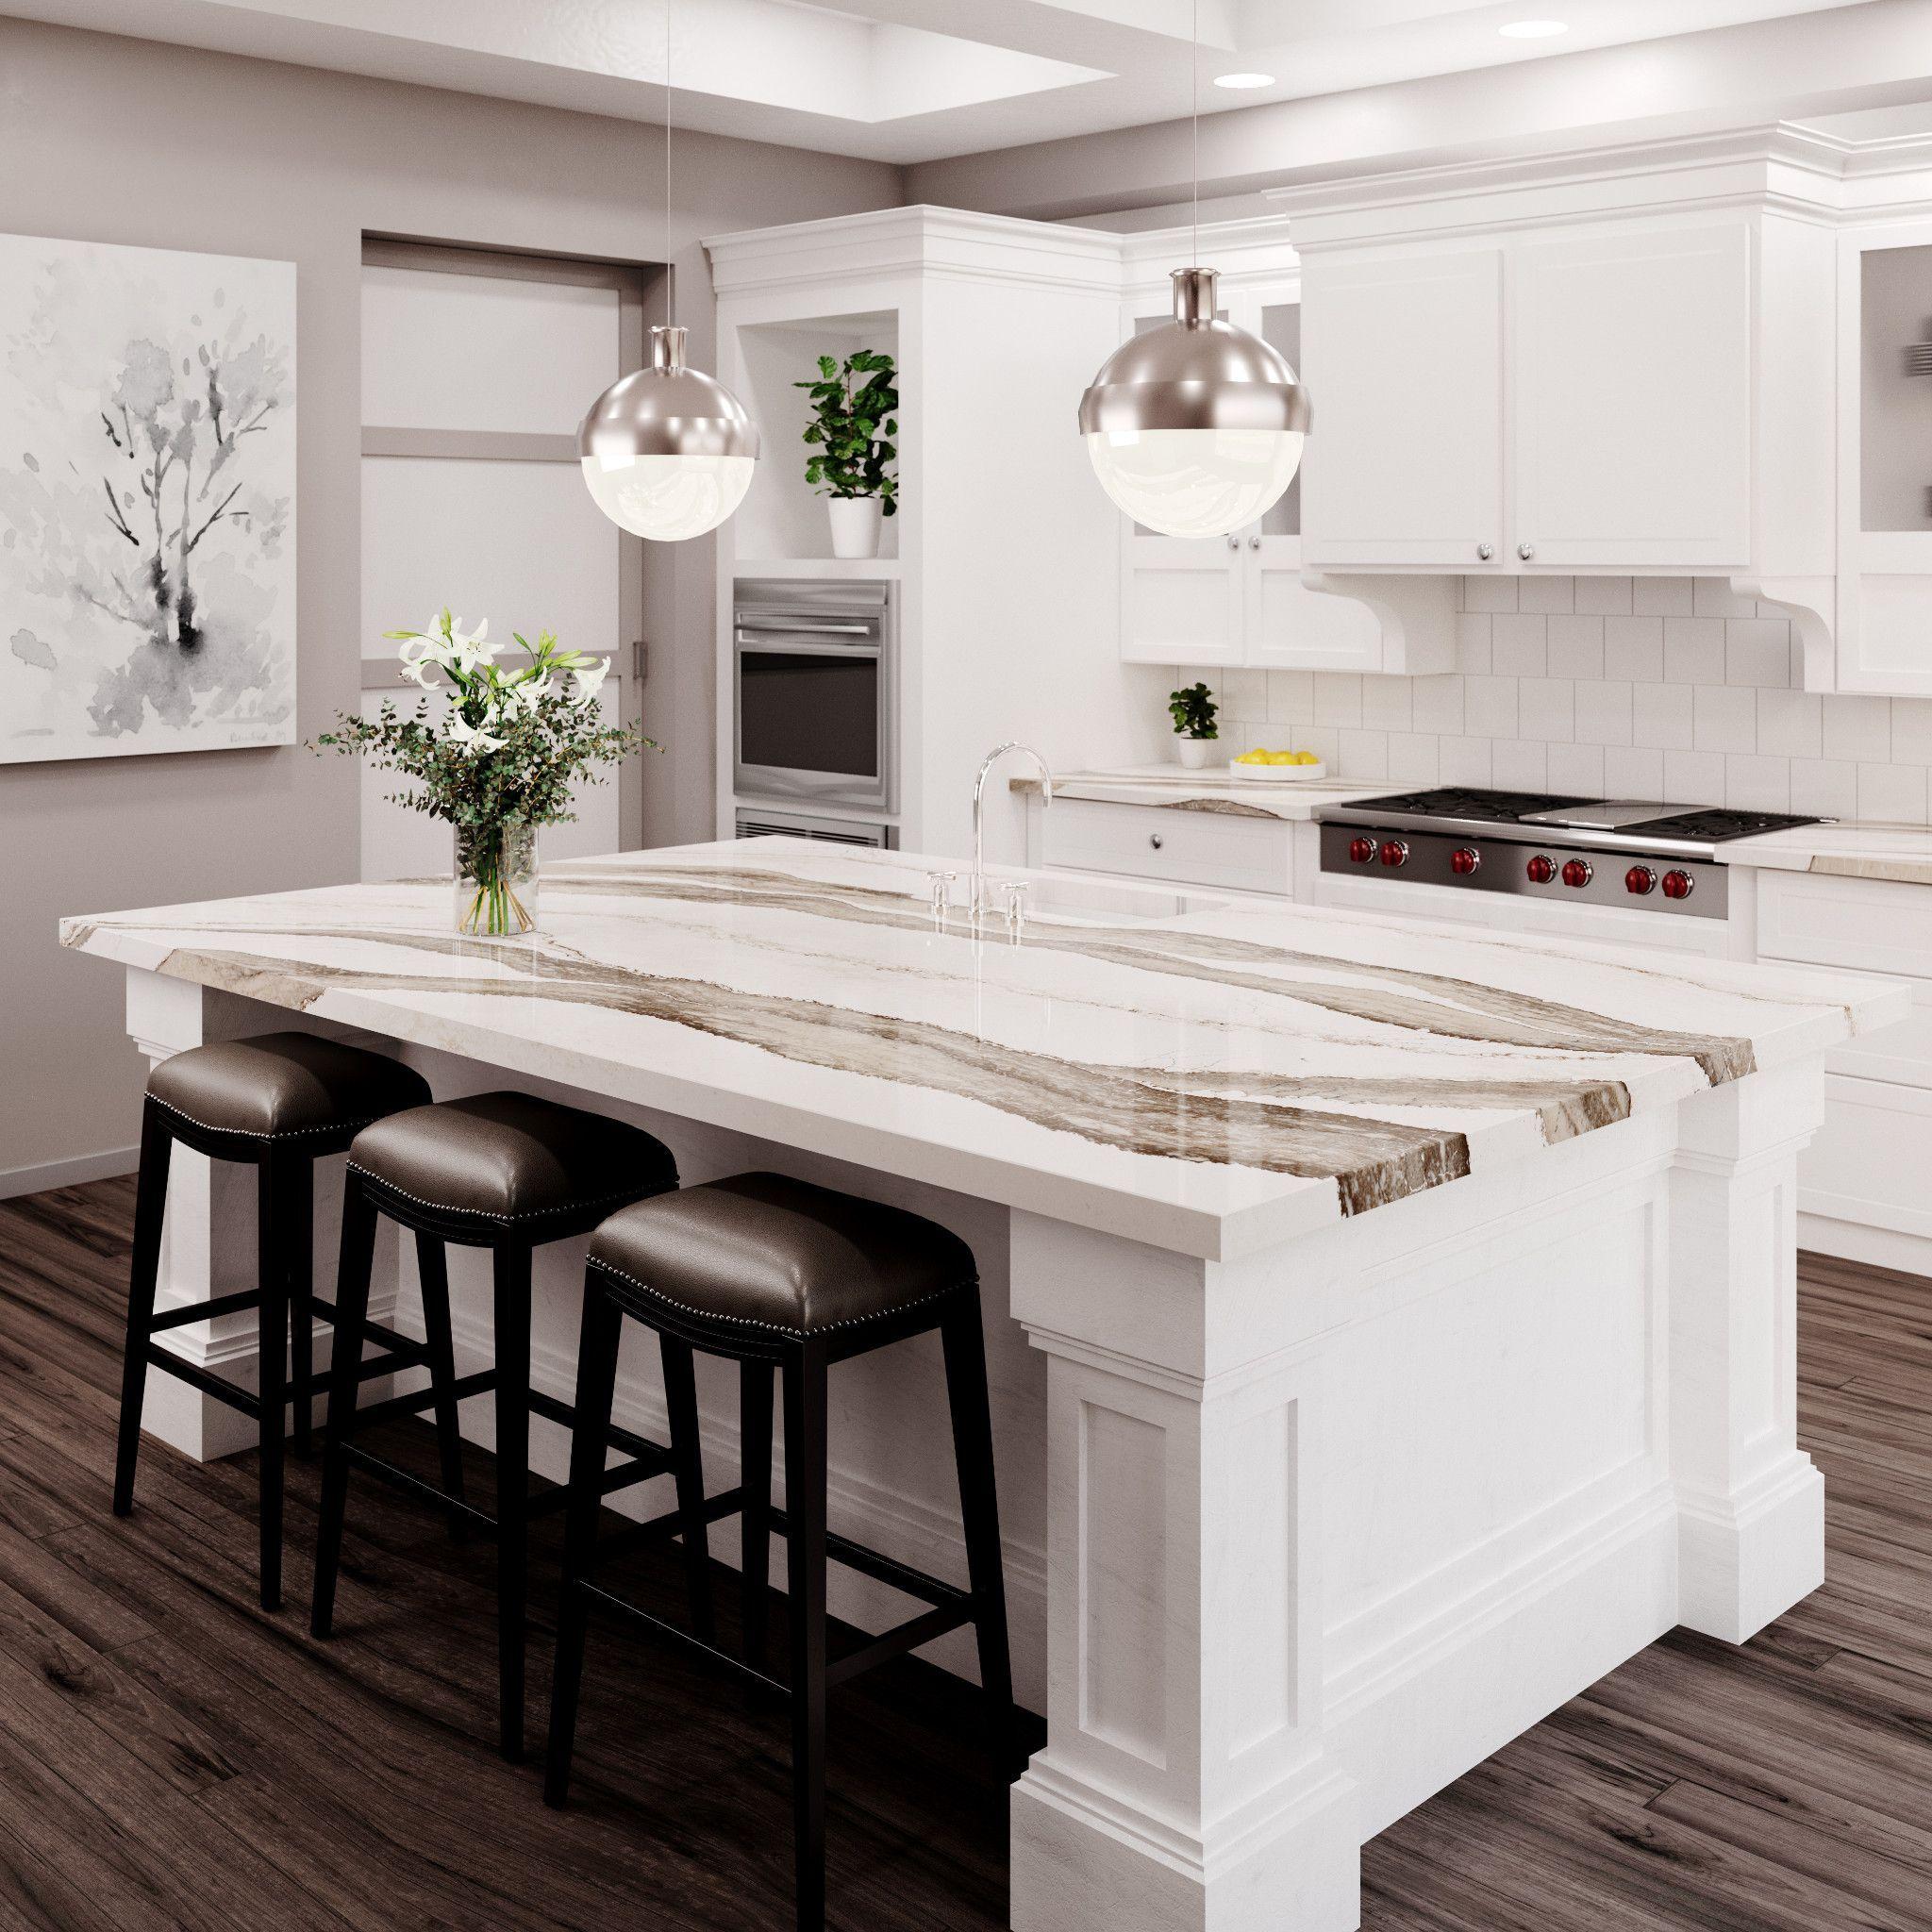 Cambria Natural Quartz Surfaces Kitchen Remodel Countertops Kitchen Remodel Small Kitchen Remodel